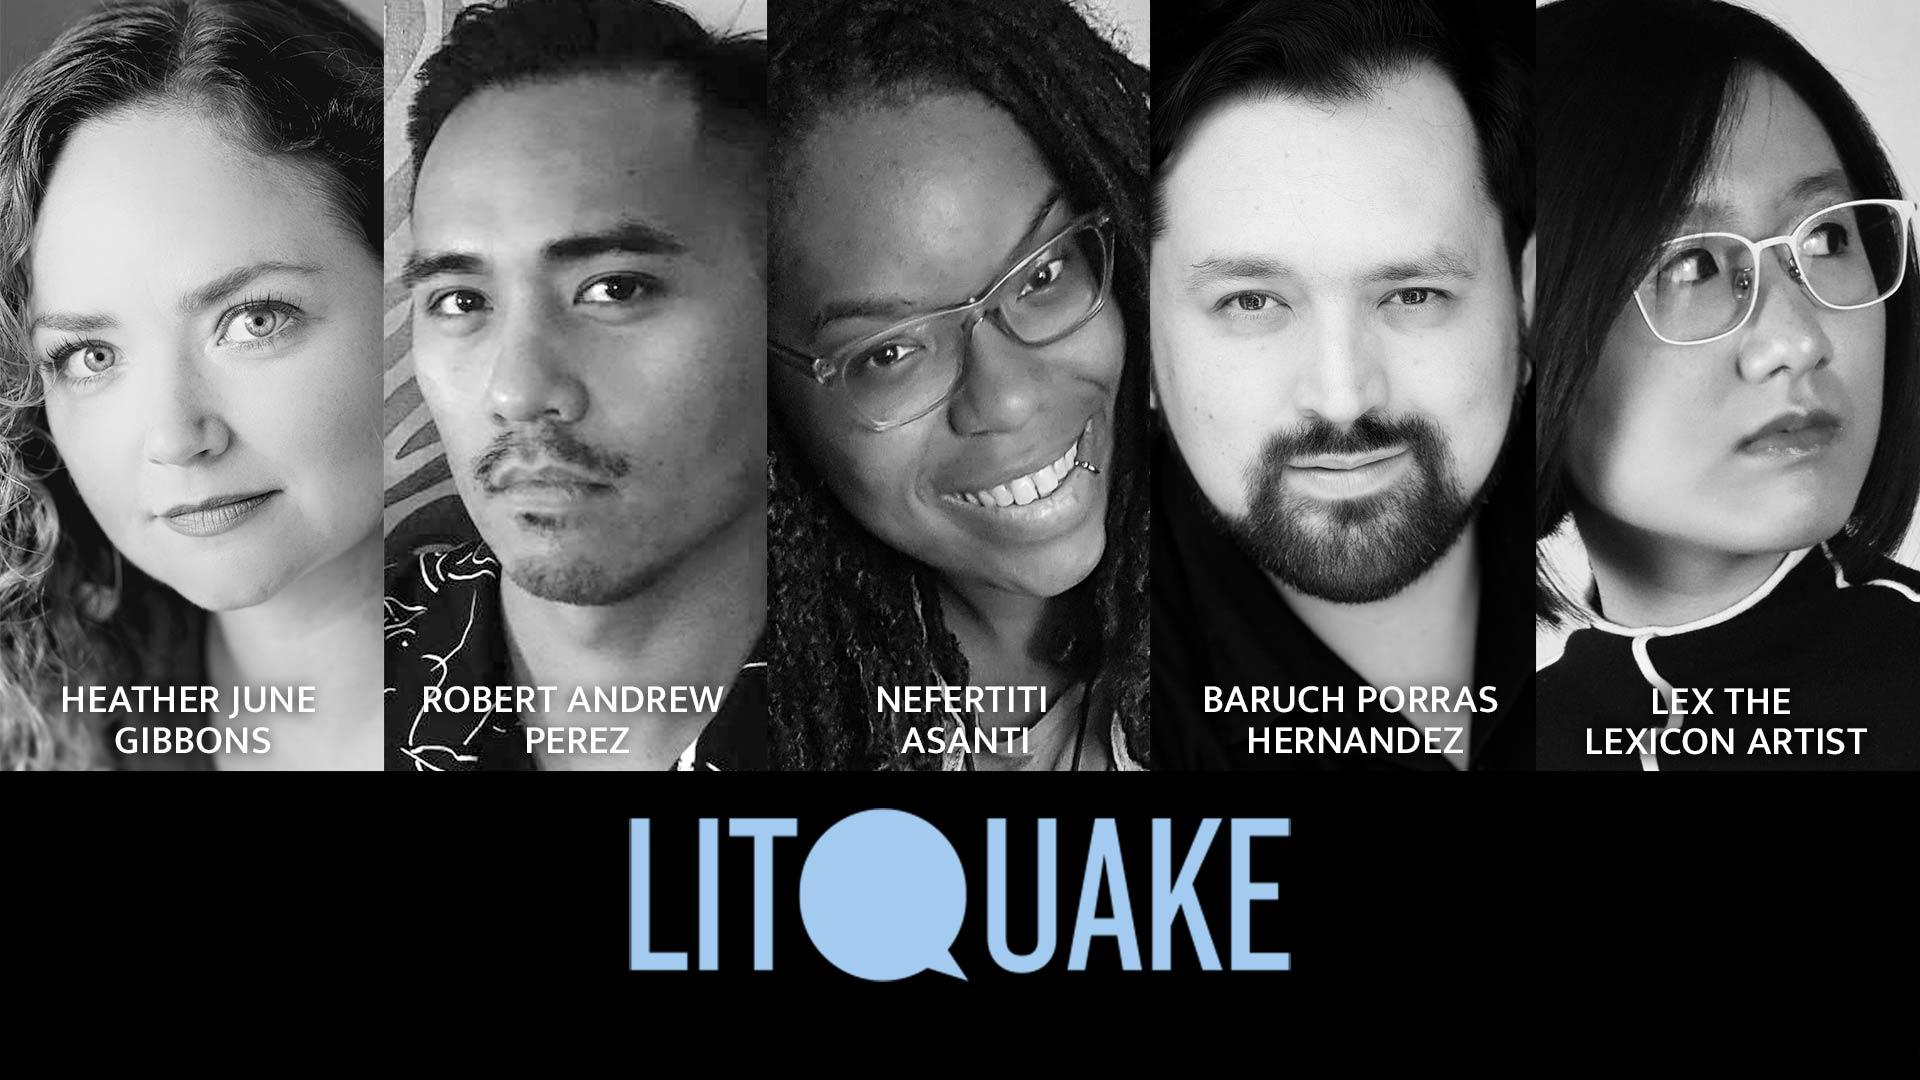 Photos of poets Heather June Gibbons, Robert Andrew Perez, Nefertiti Asanti, Baruch Porras Hernandez, and musician Lex the Lexicon Artist